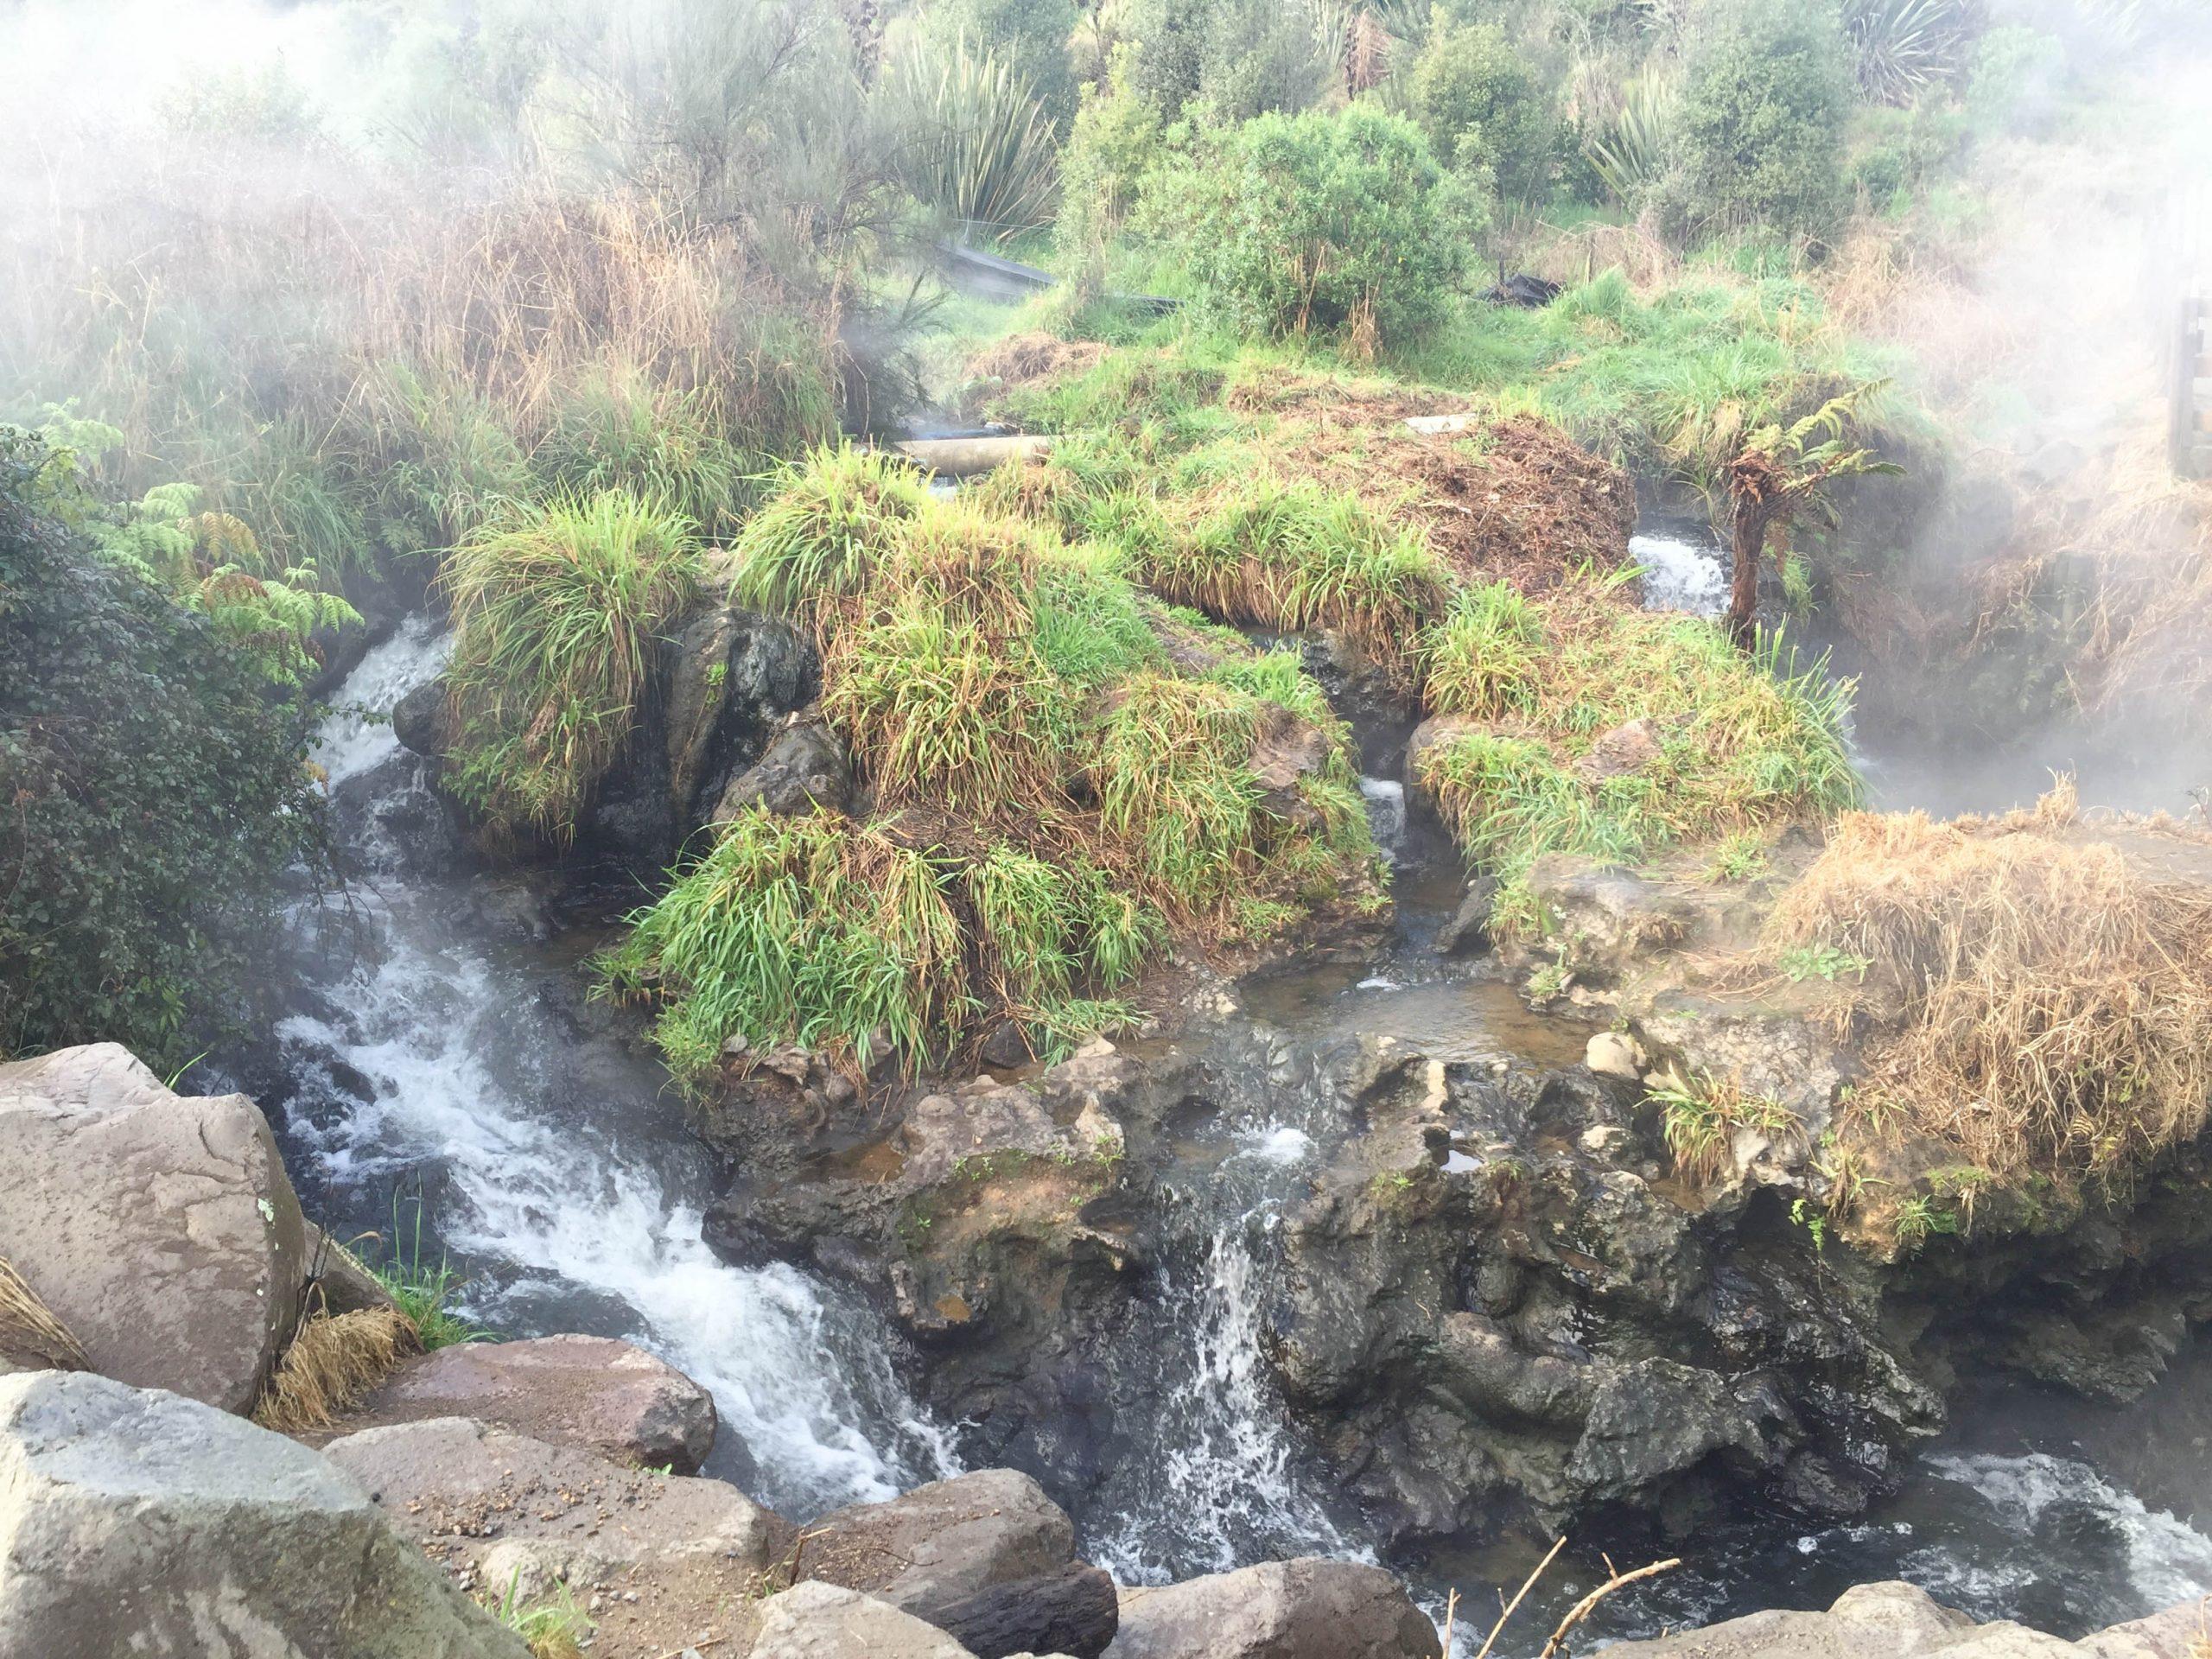 Spa Park Thermal River Taupo